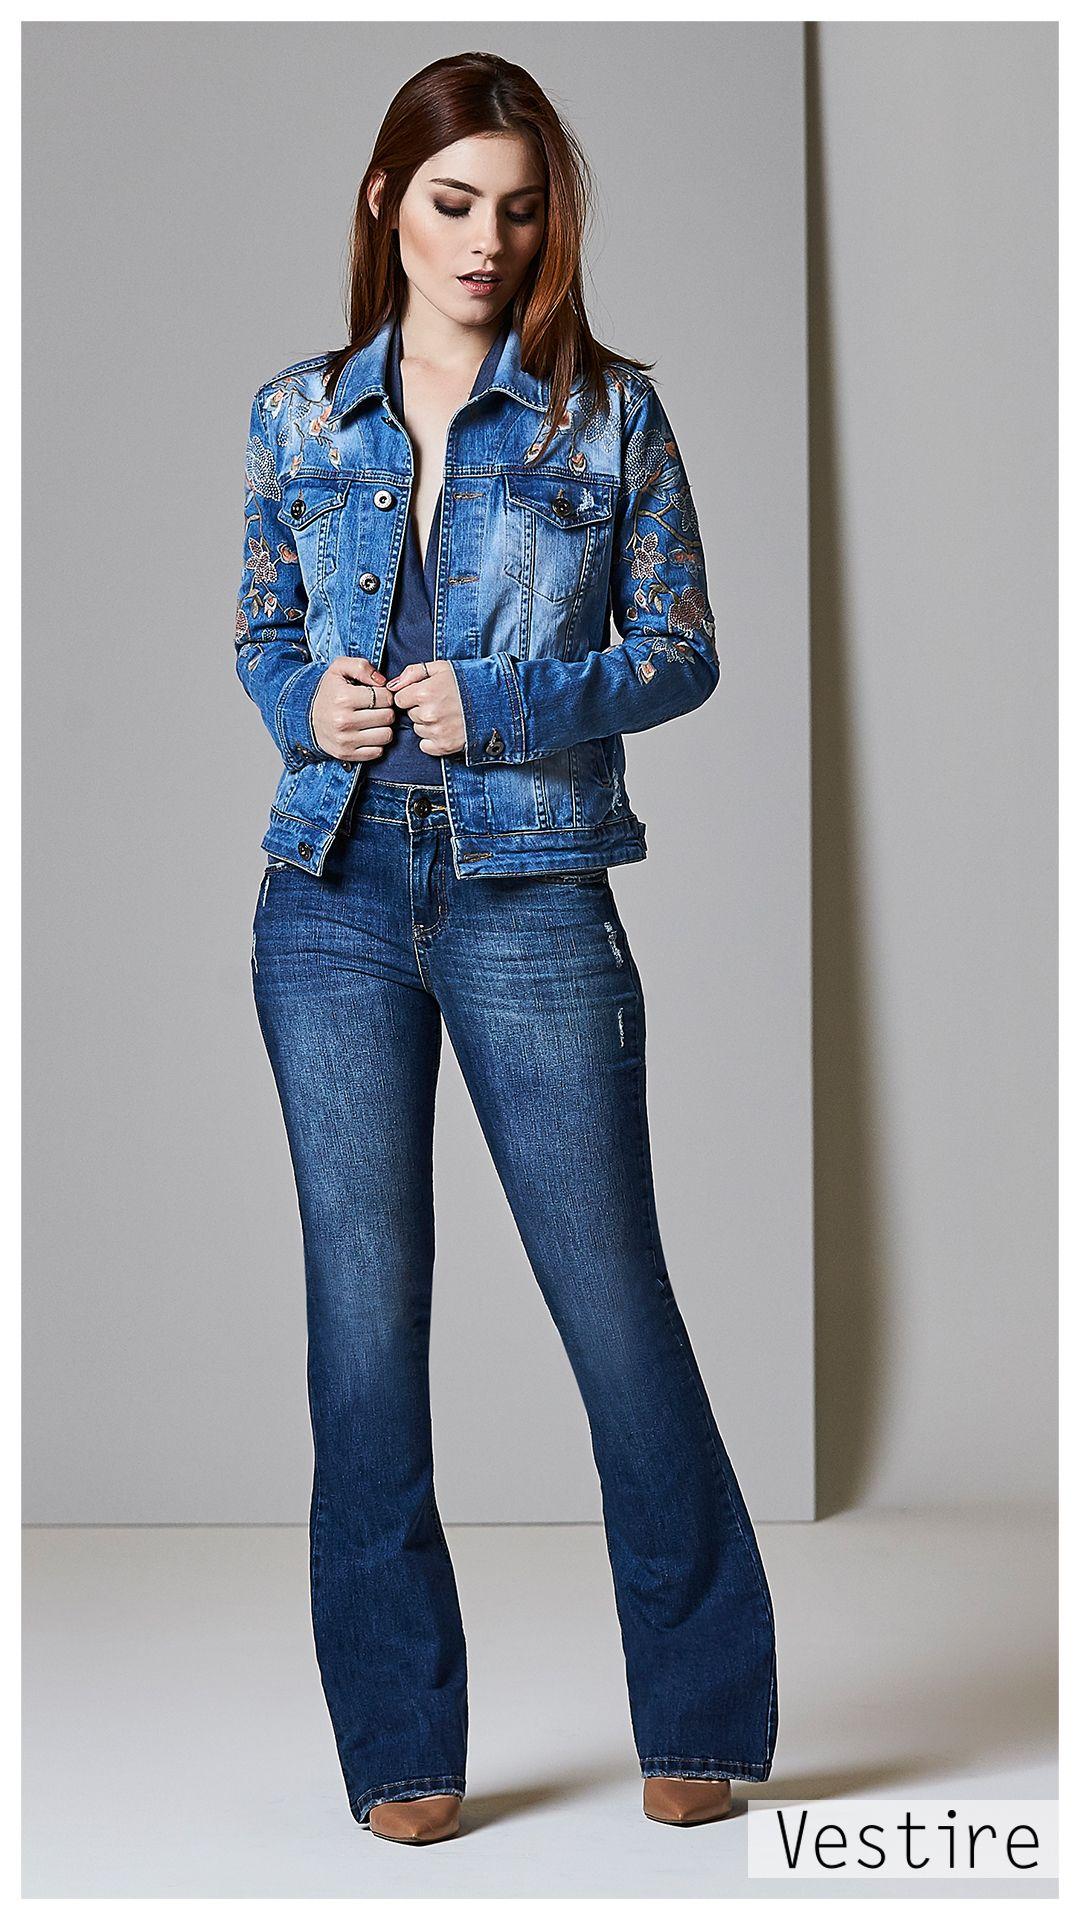 5ec6dd3f8 Look Book: Inverno 17. Tendencia. Denim. Jeans. Camisa Feminina. Vestire  Jeans. Moda Feminina. Jeans Feminino. Calça Flare. Lavagem média. Jaqueta  Jeans ...